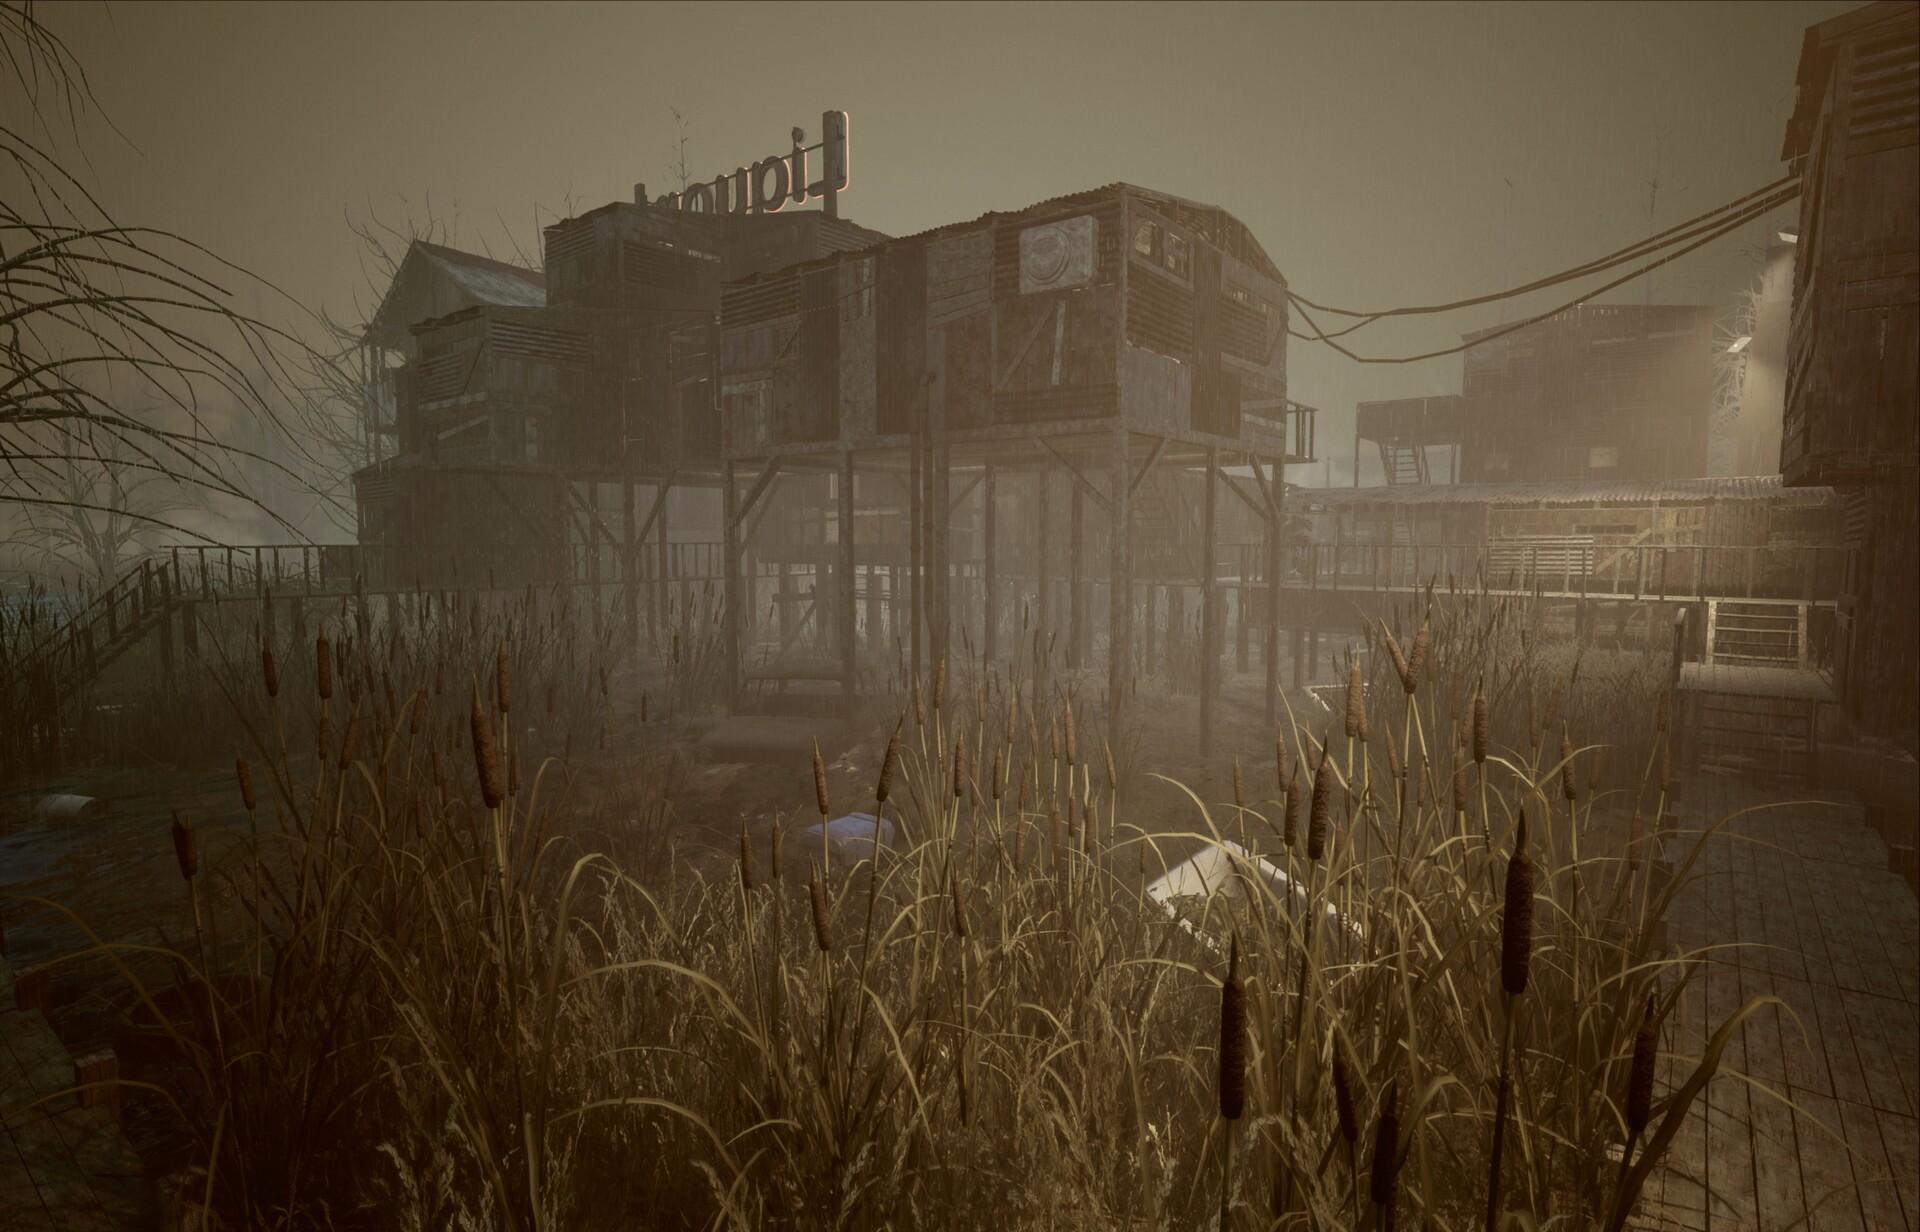 ArtStation - Fallout 4 Murkwater - Unreal Engine 4, Ghost Design